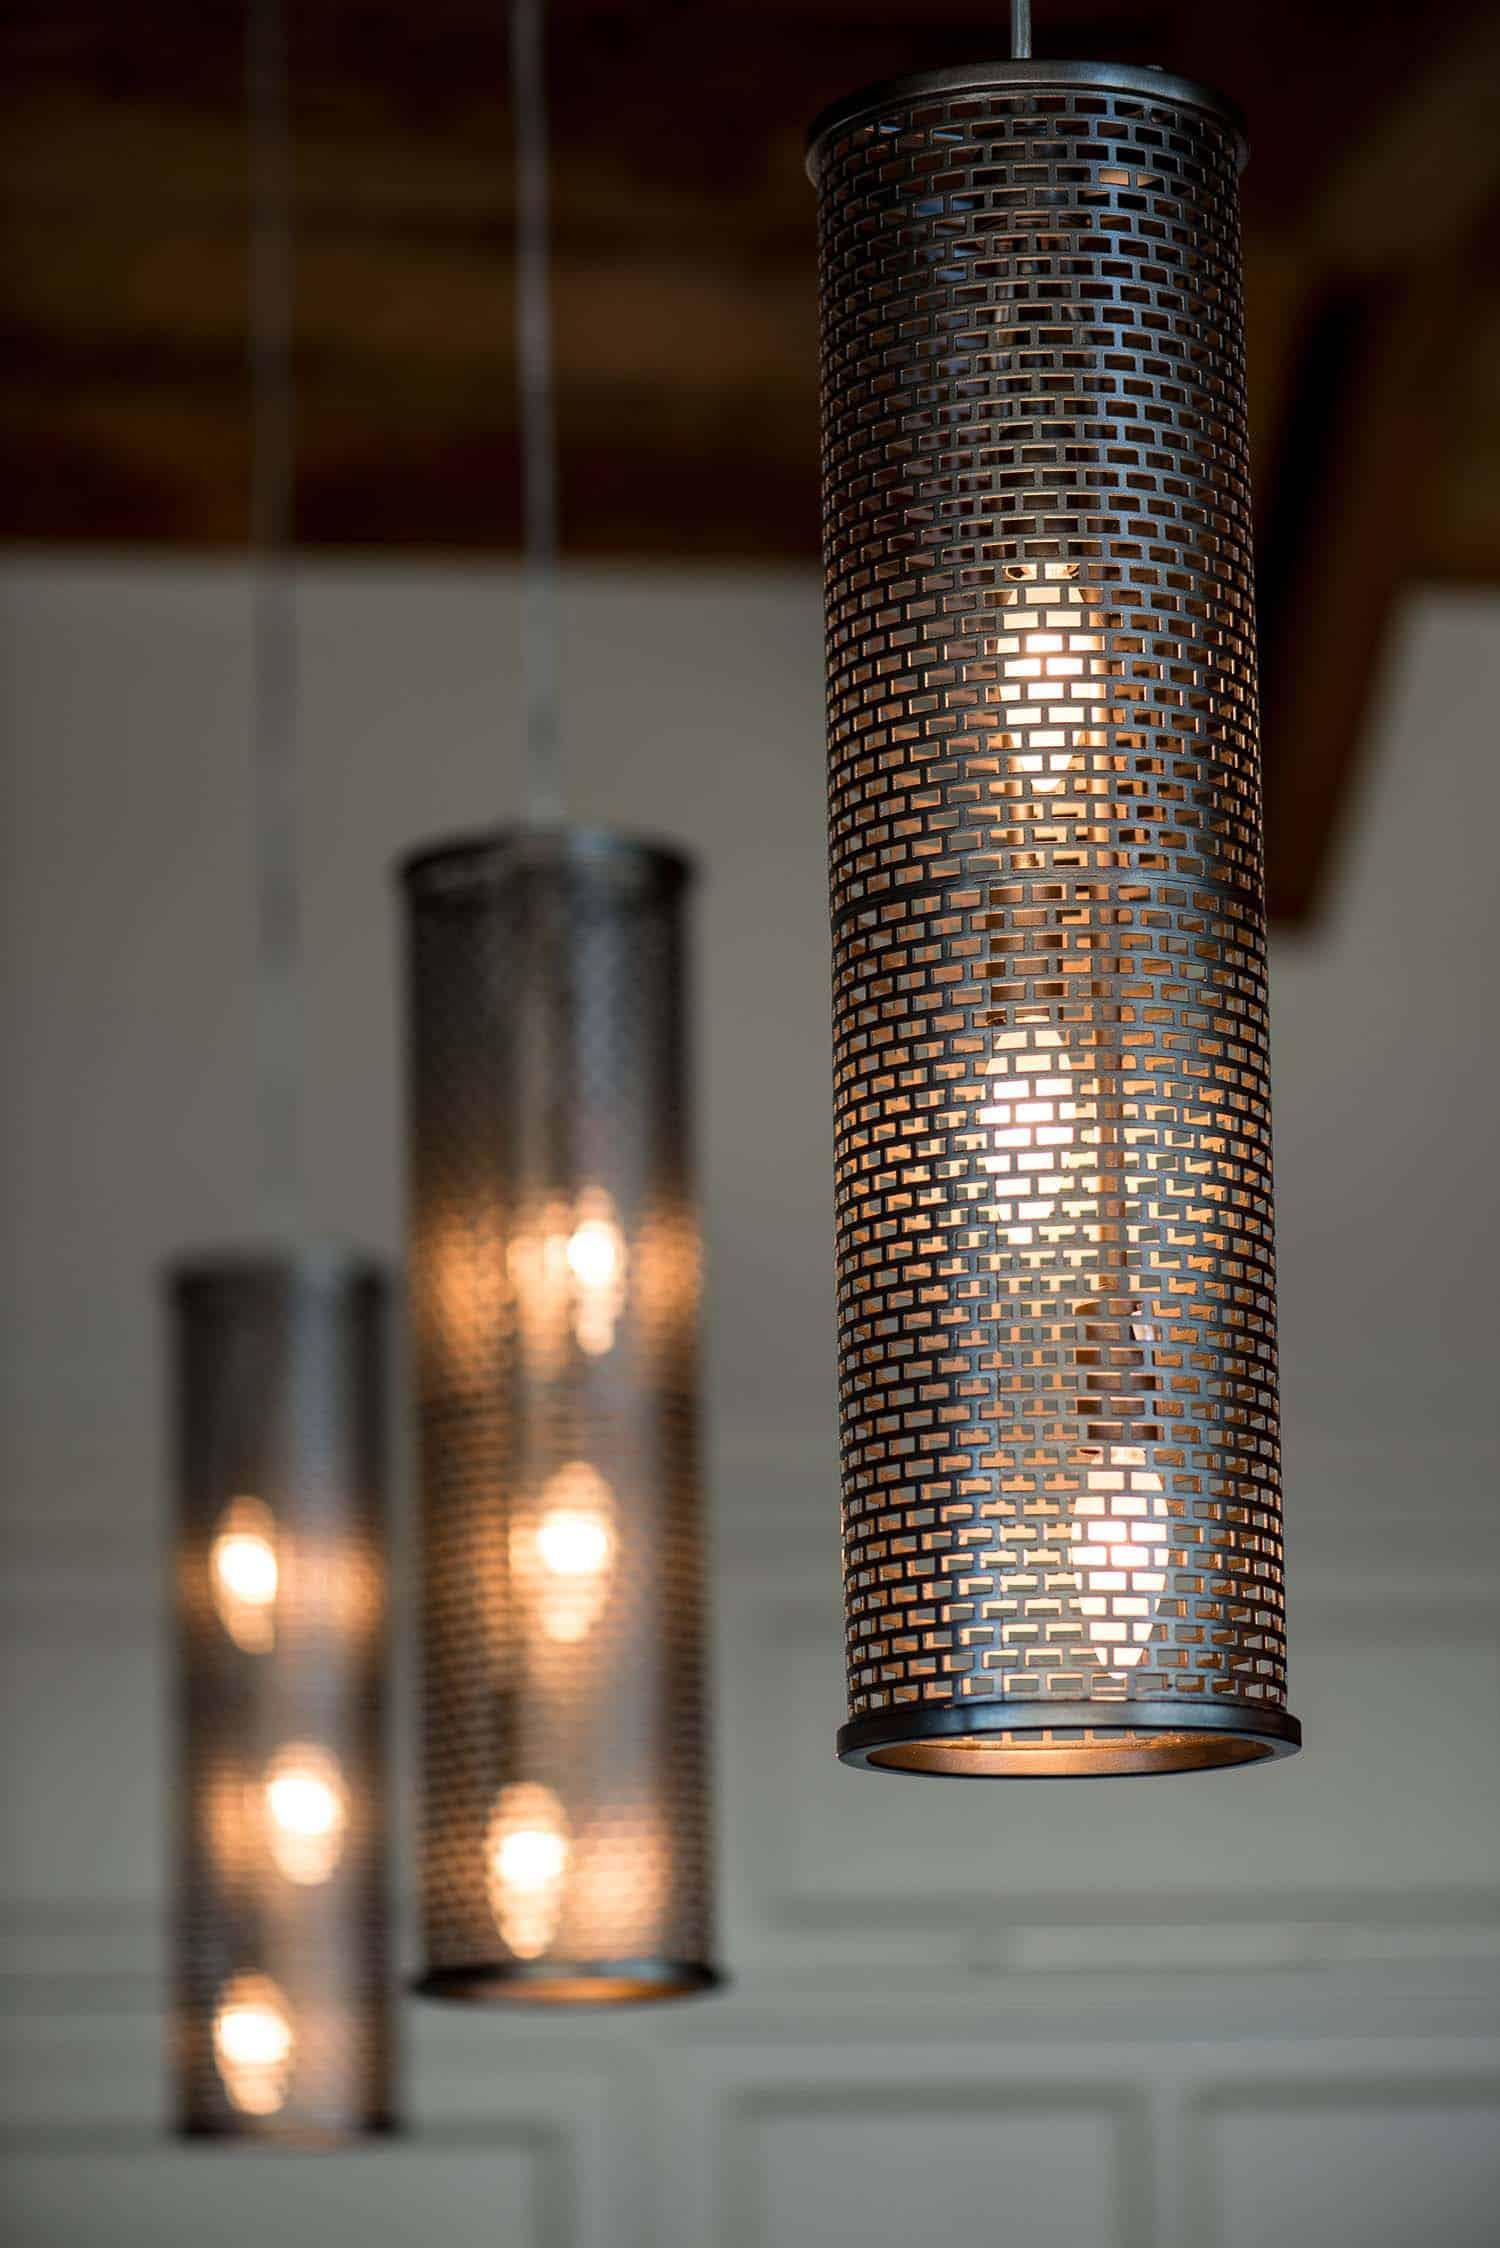 rustic-kitchen-light-fixture-detail